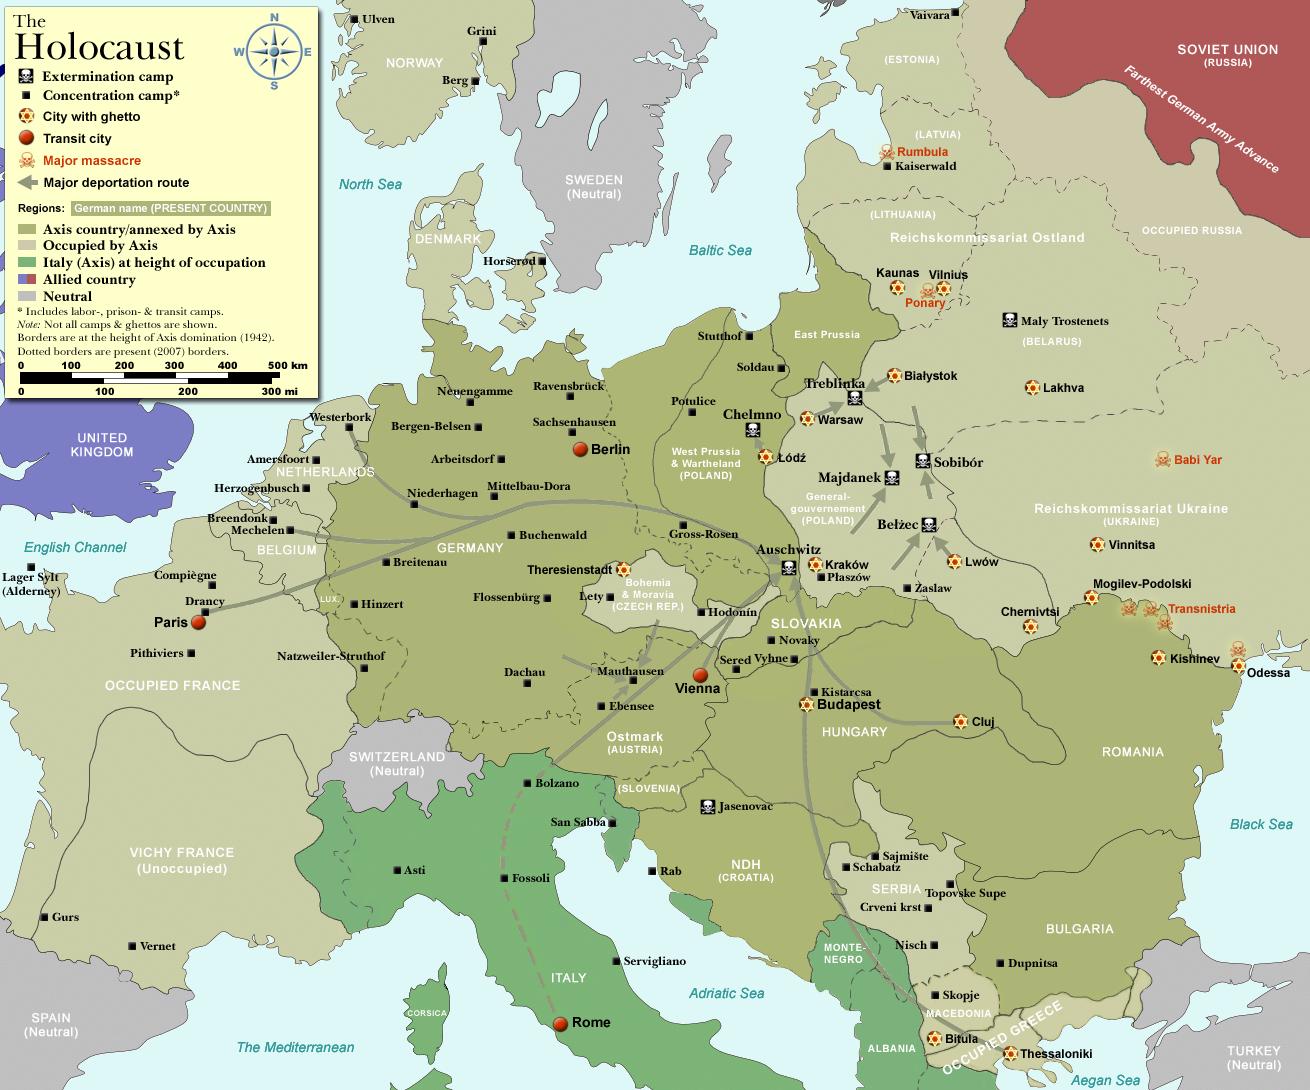 WW2-Holocaust-Europe